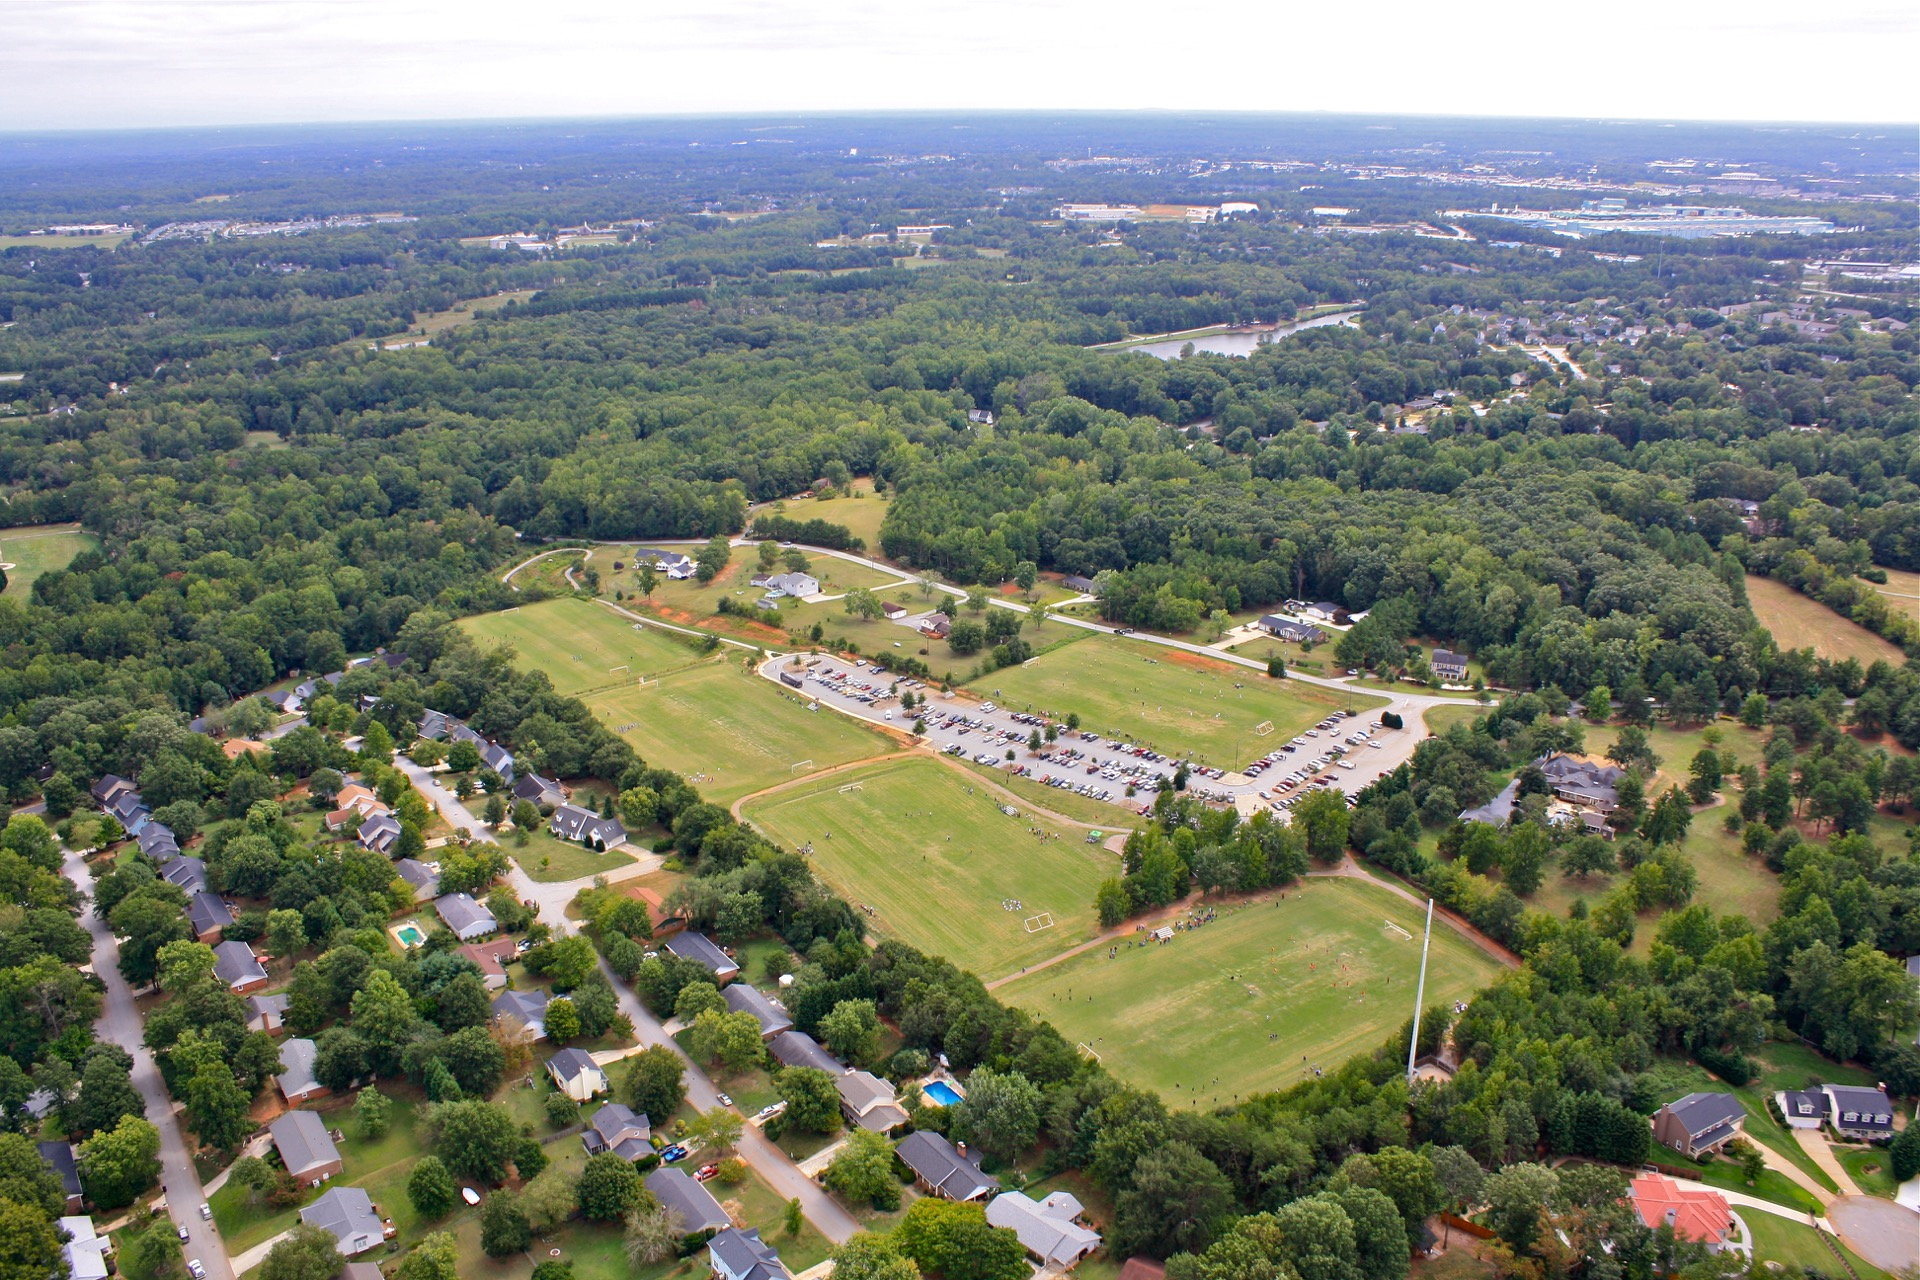 gary L. Pittman park aerial view